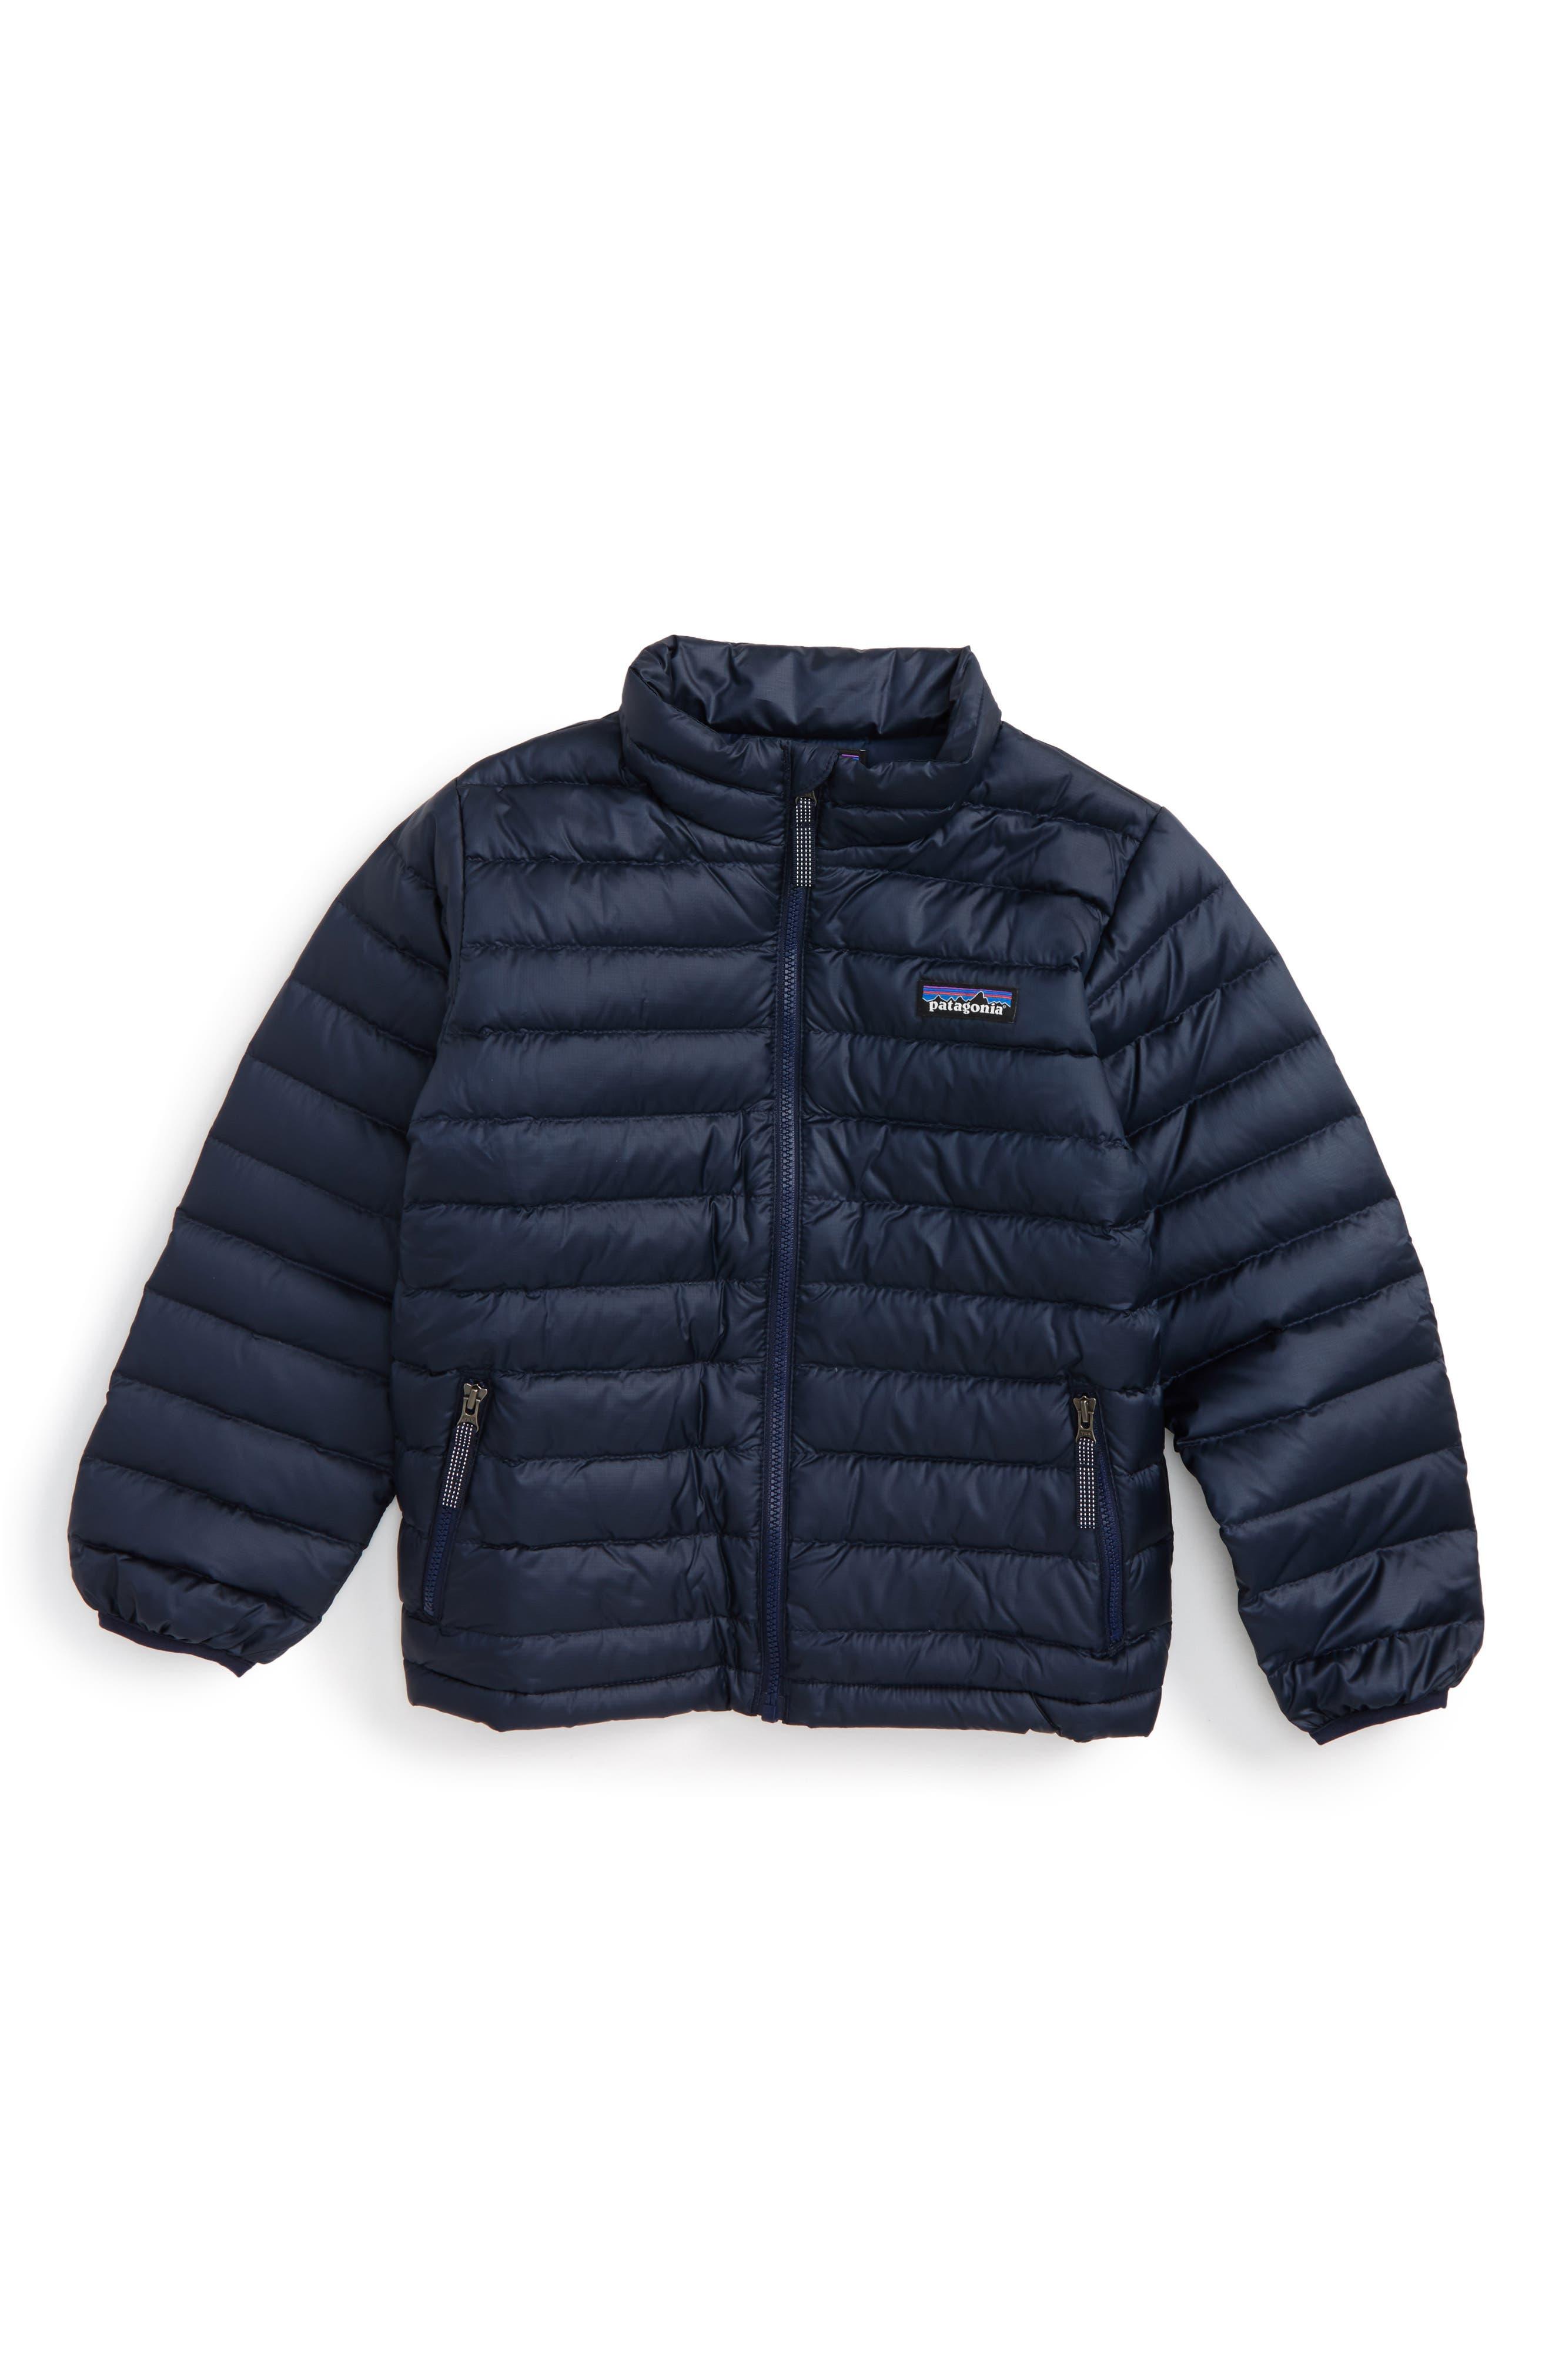 Water Repellent 600-Fill Power Down Sweater Jacket,                             Main thumbnail 1, color,                             BALB BALKAN BLUE